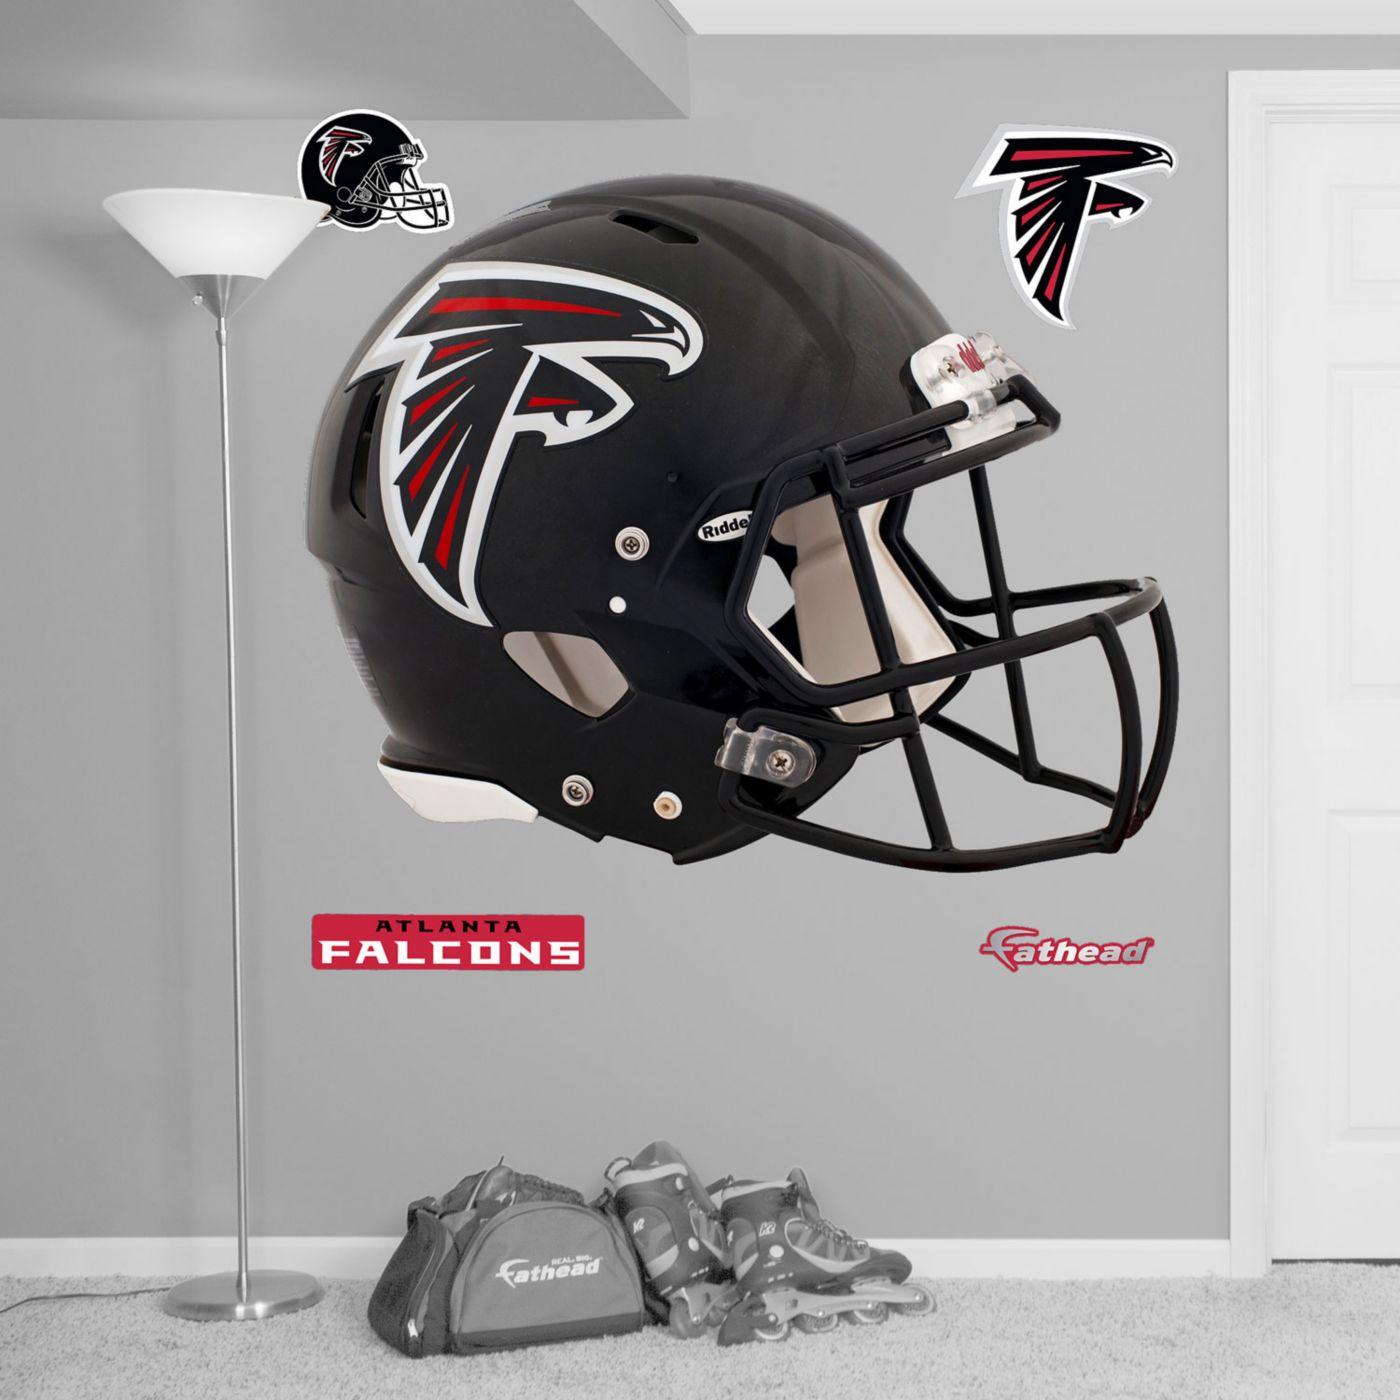 Fathead Atlanta Falcons Helmet Logo Wall Graphic